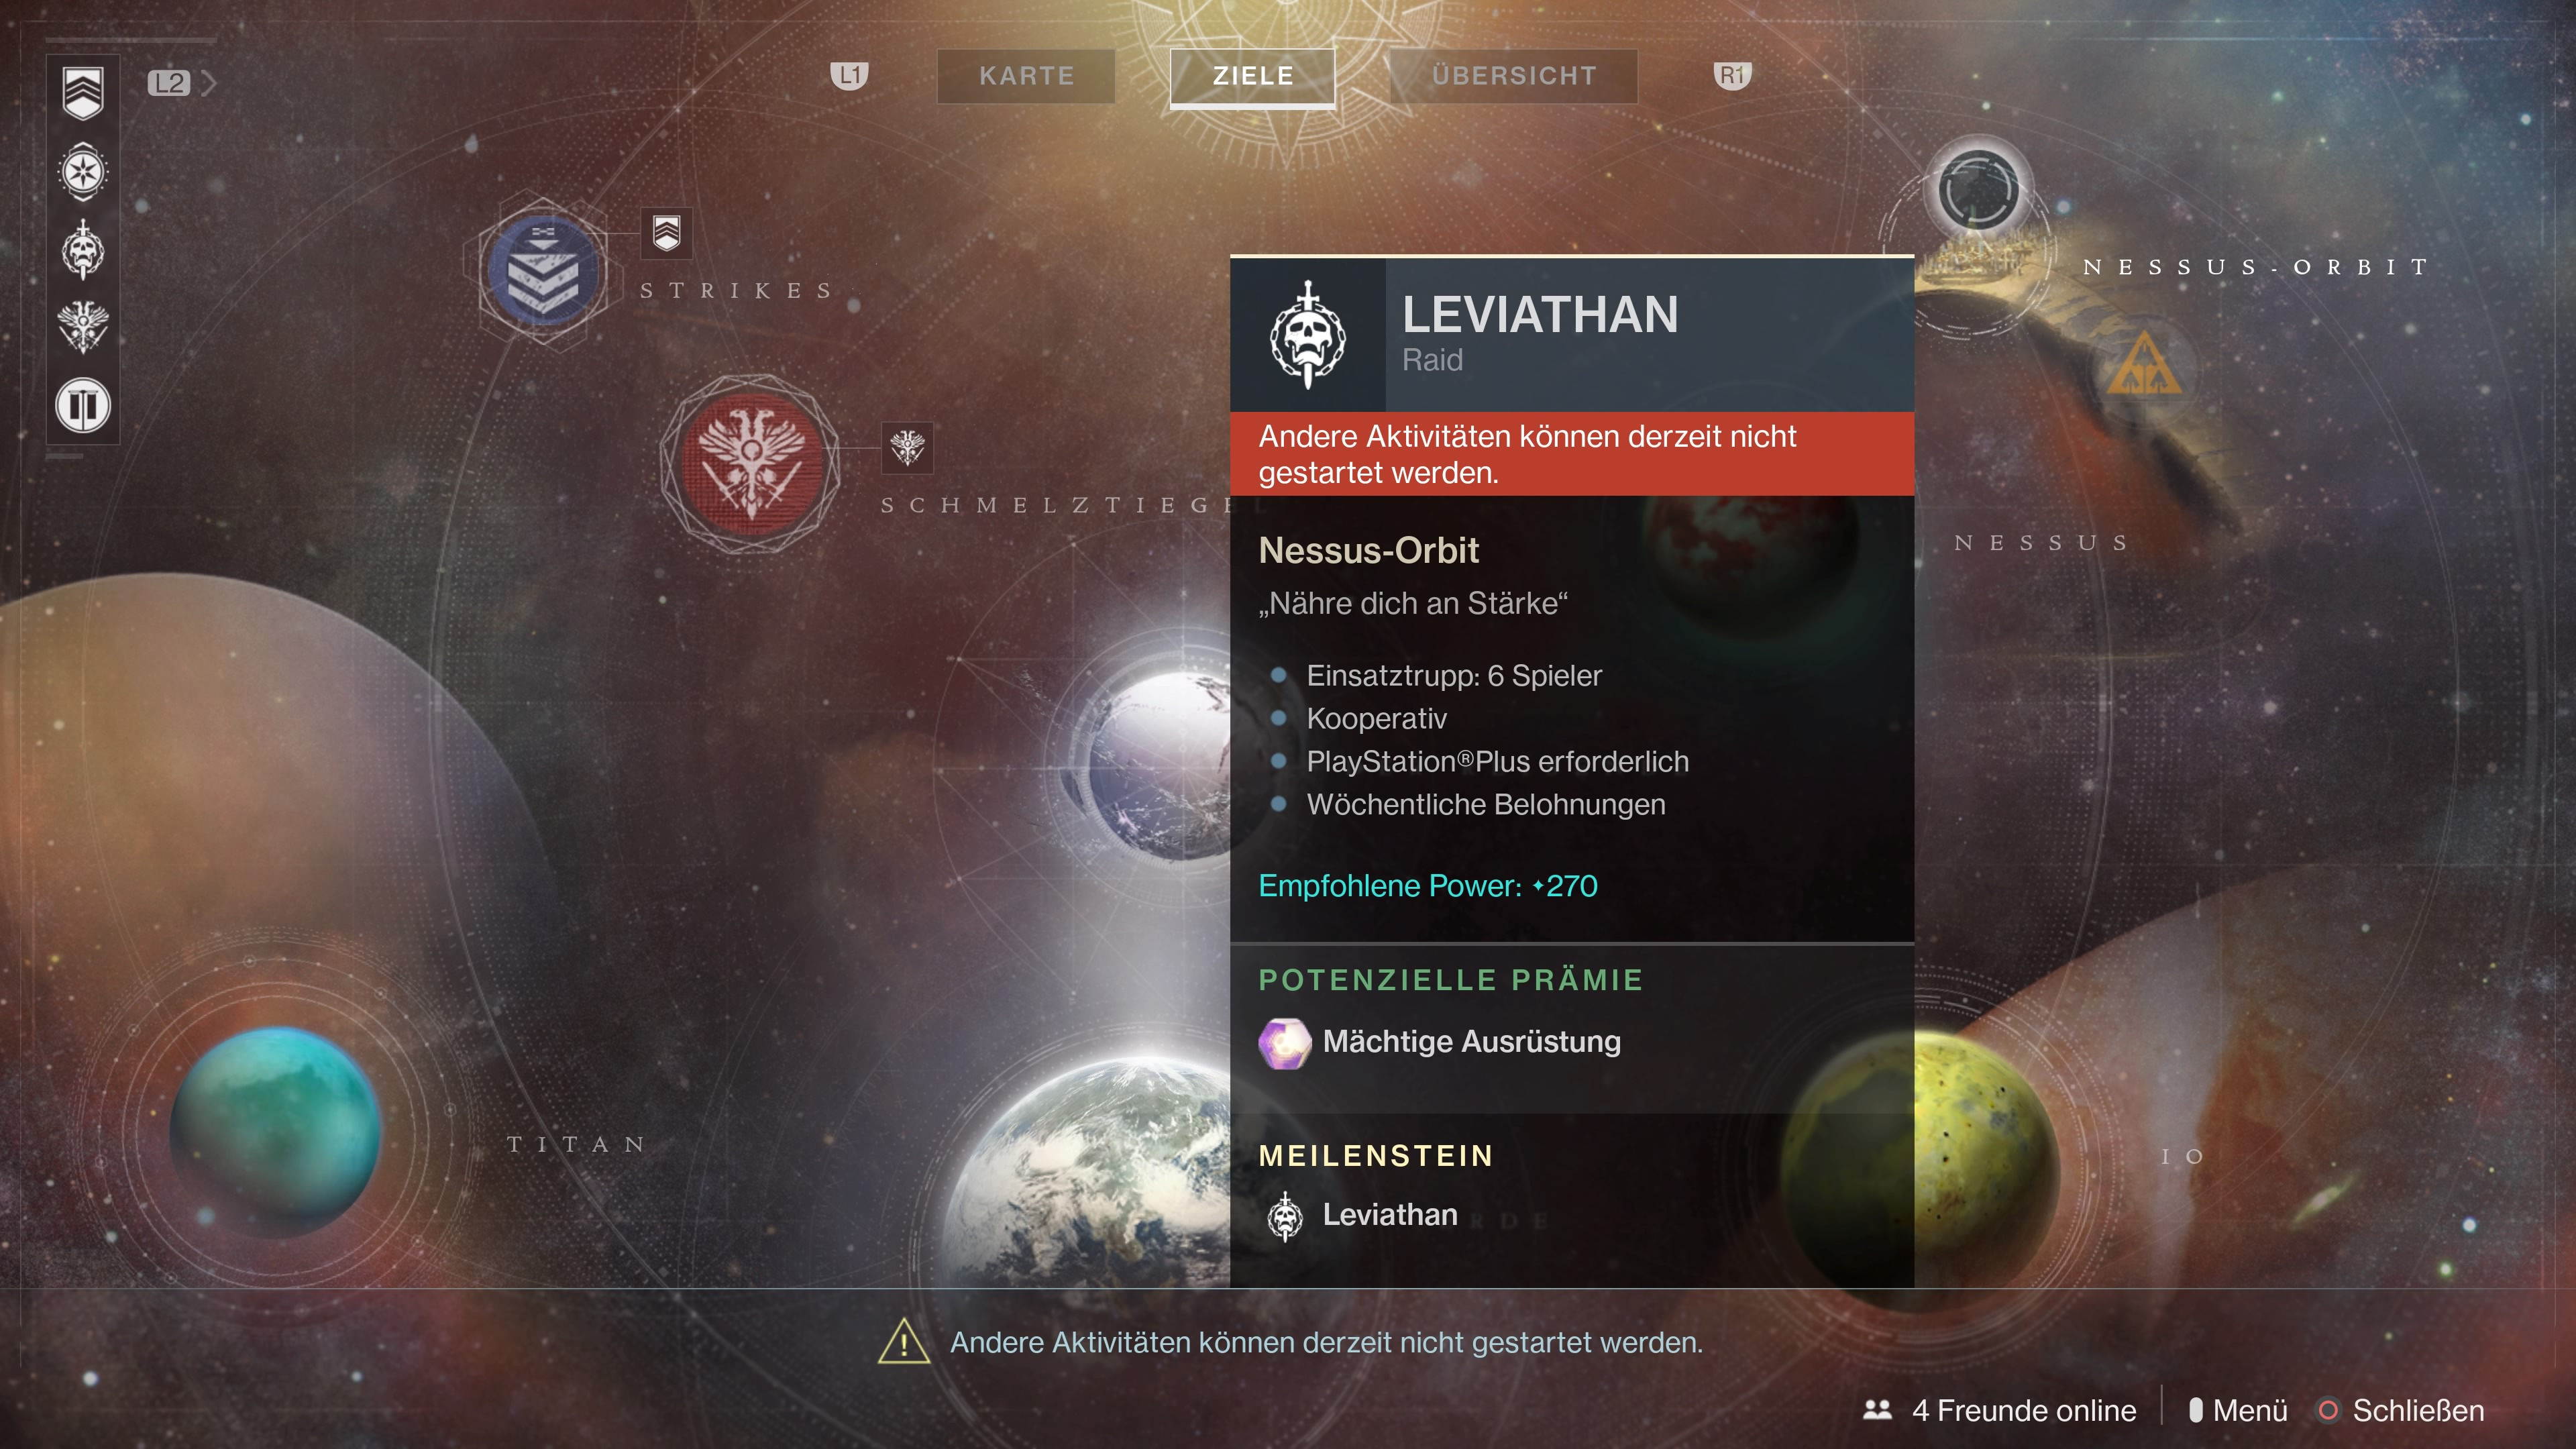 Destiny 2 Raid Karte.Destiny 2 Leviathan Raid Guide Und Komplettlösung